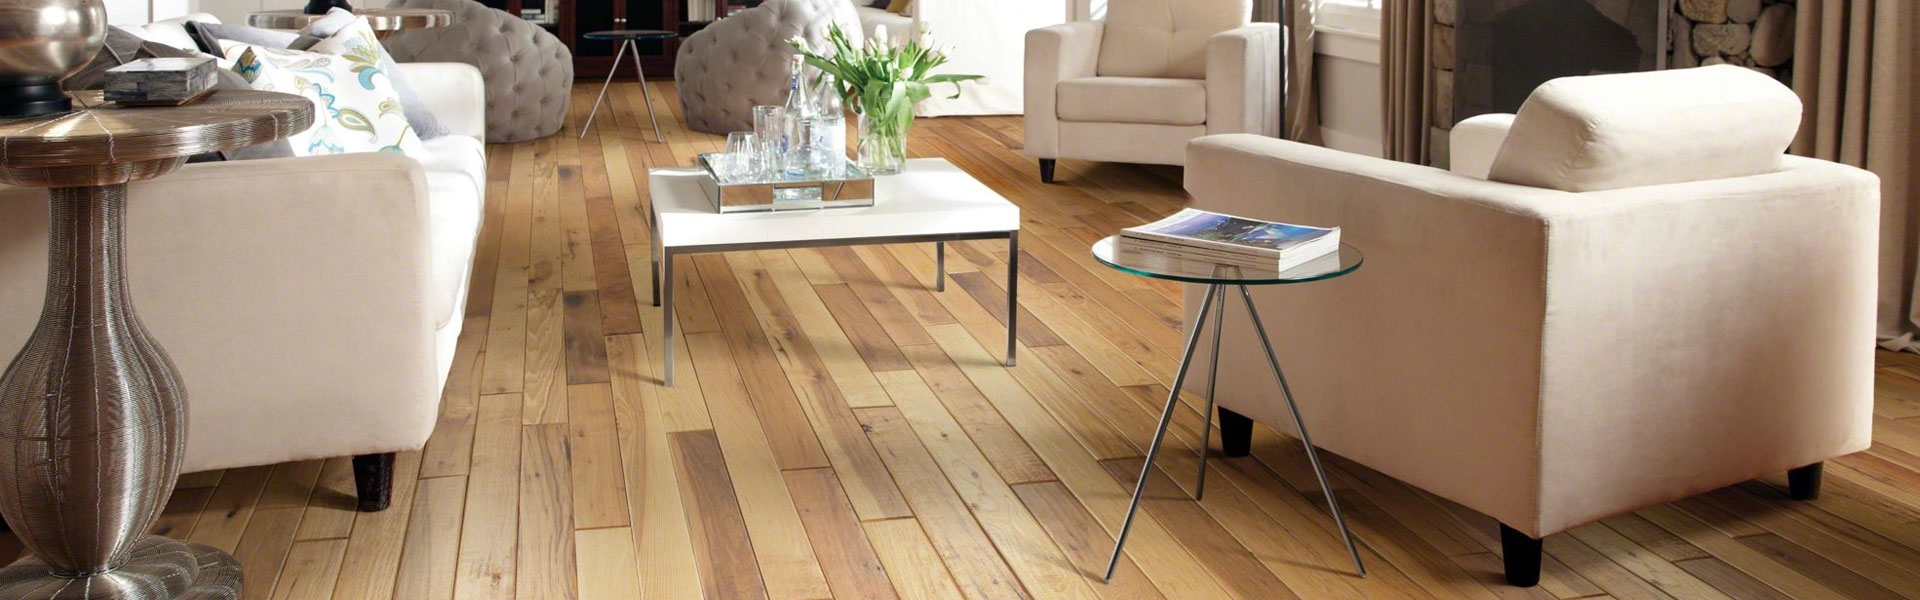 Hardwood flooring solutions in pittsburgh coraopolis for Hardwood floors pittsburgh